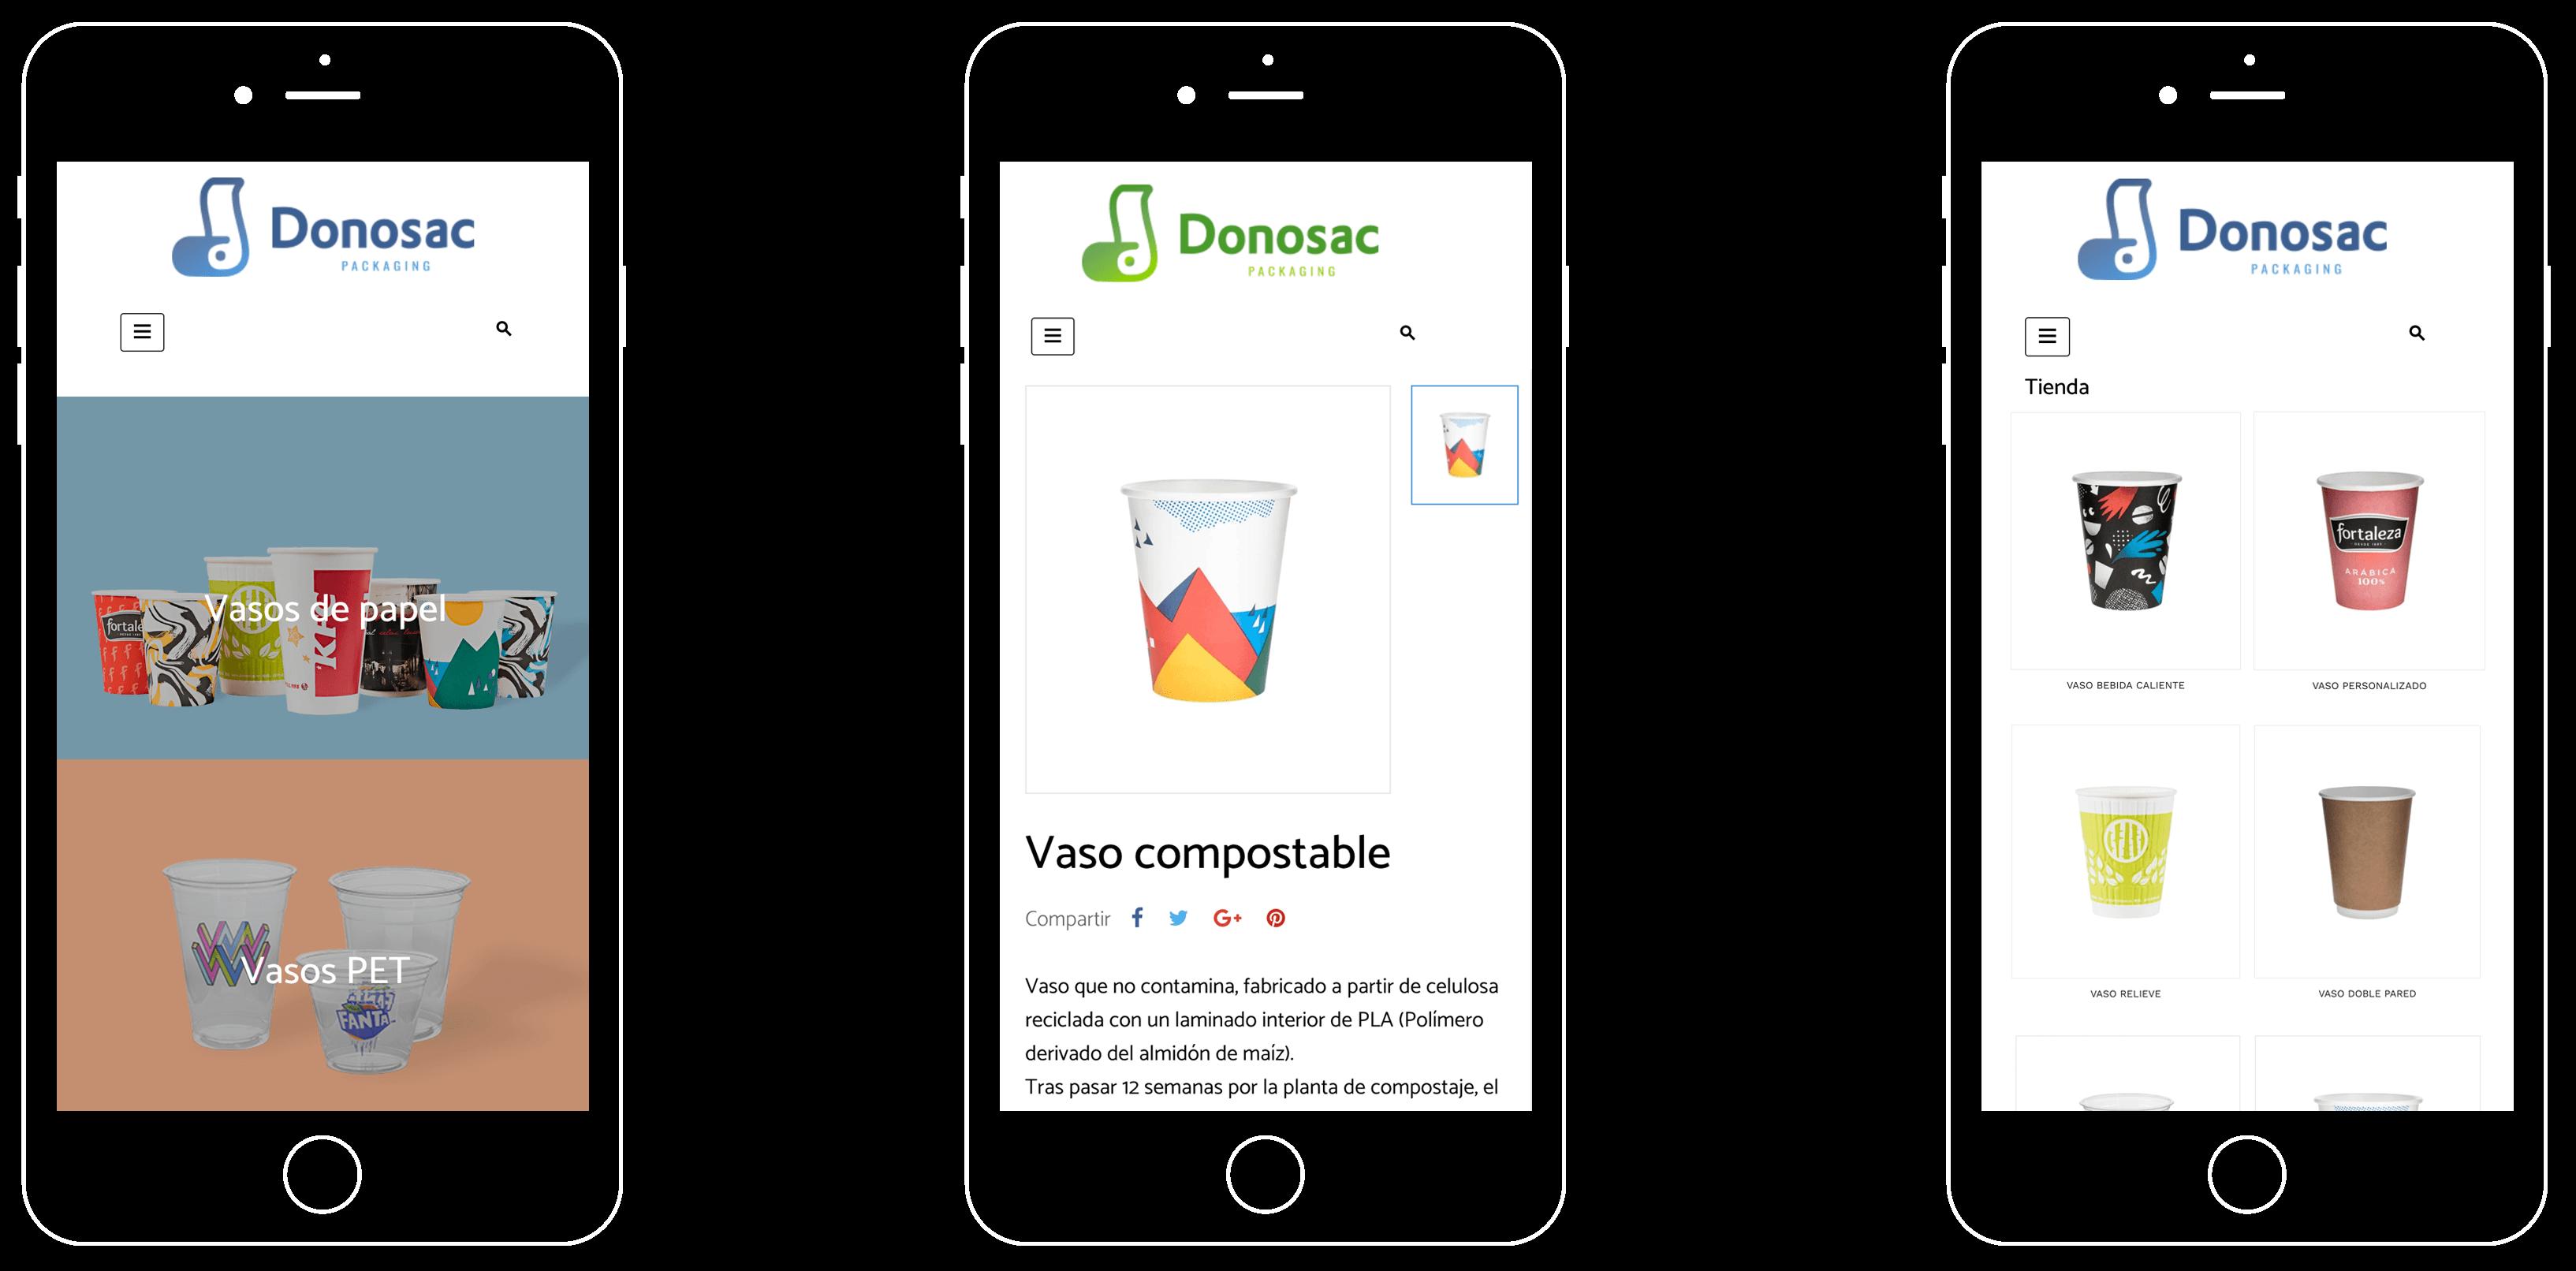 Donosac 5